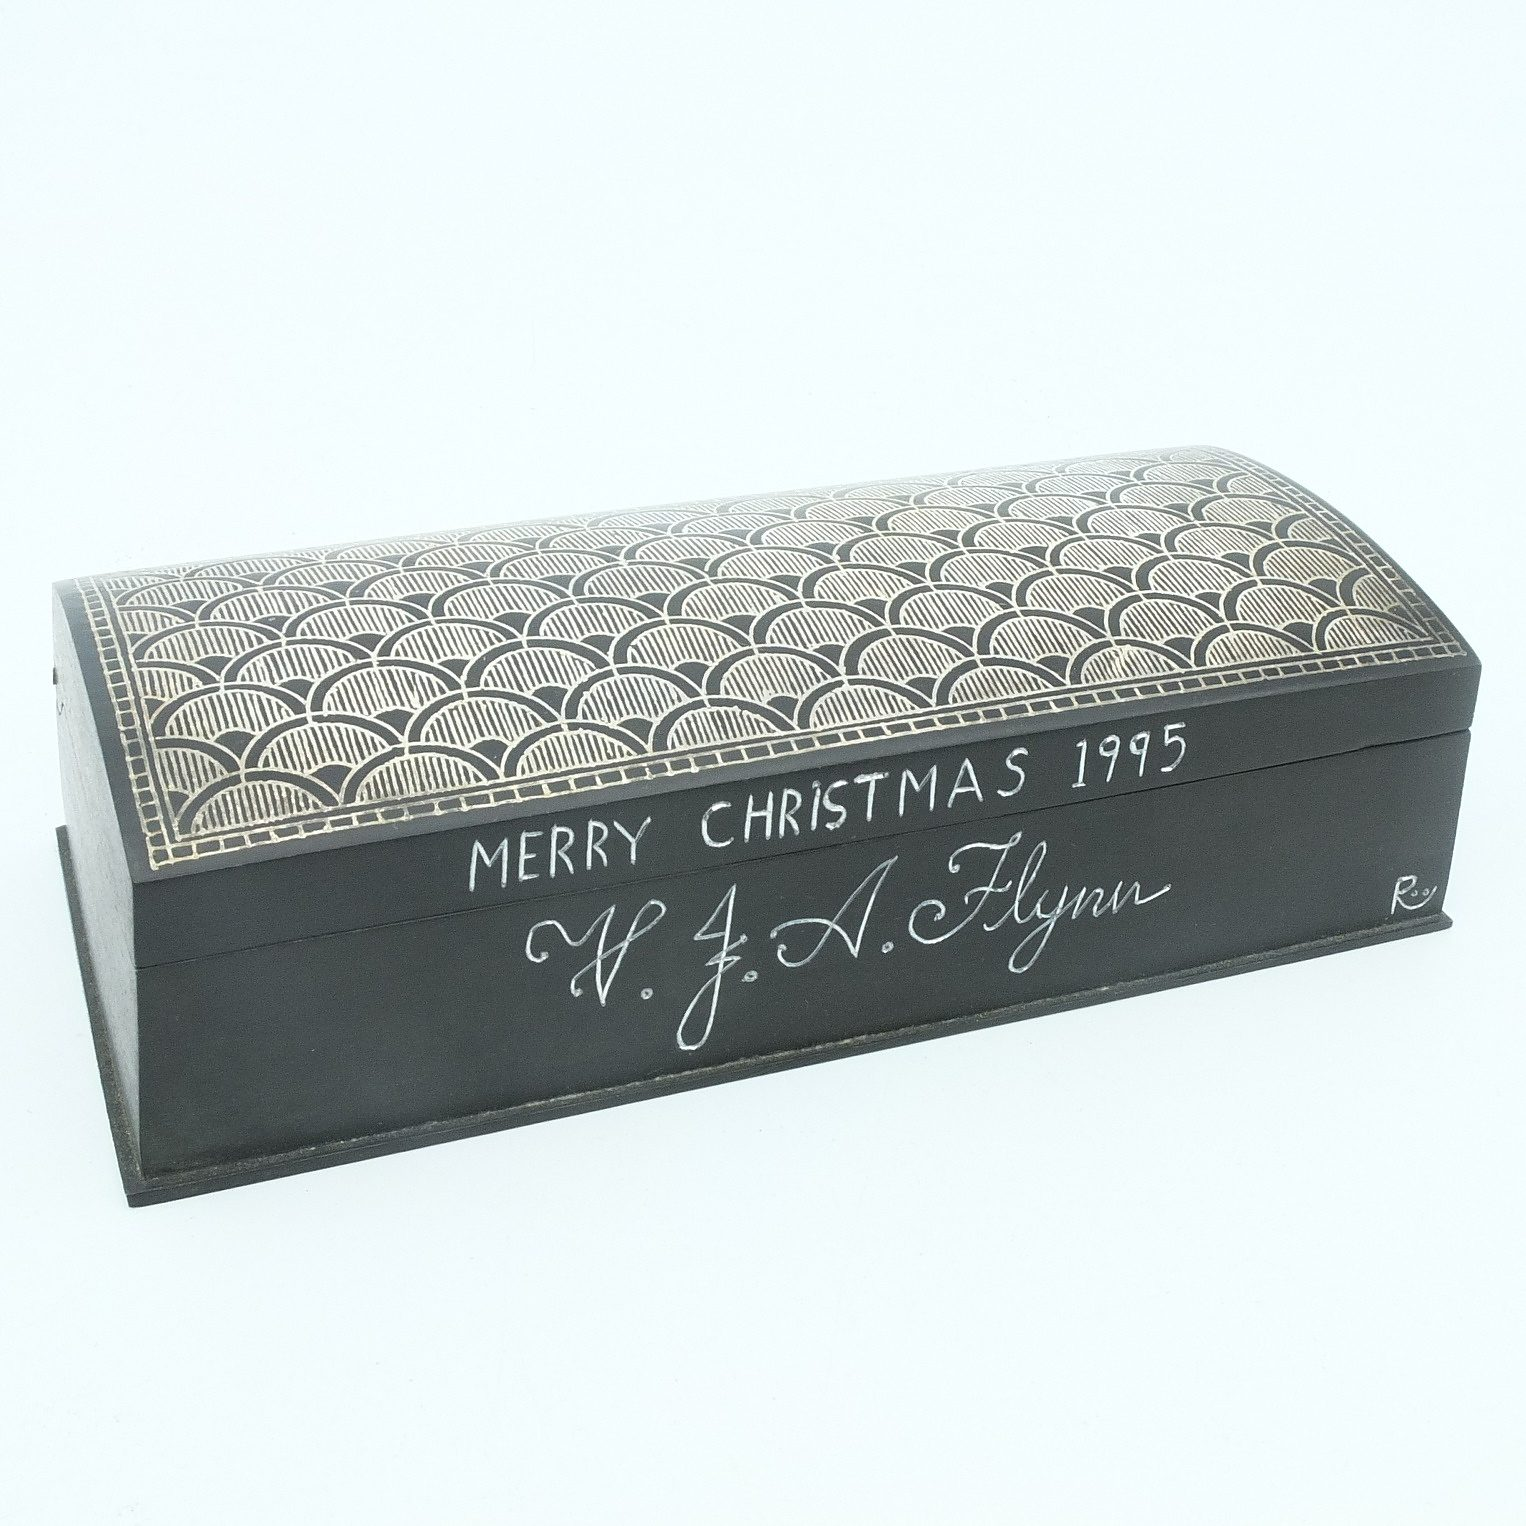 'Indian Niello Work Box With Inscription Merry Christmas 1995 V J A Flynn'